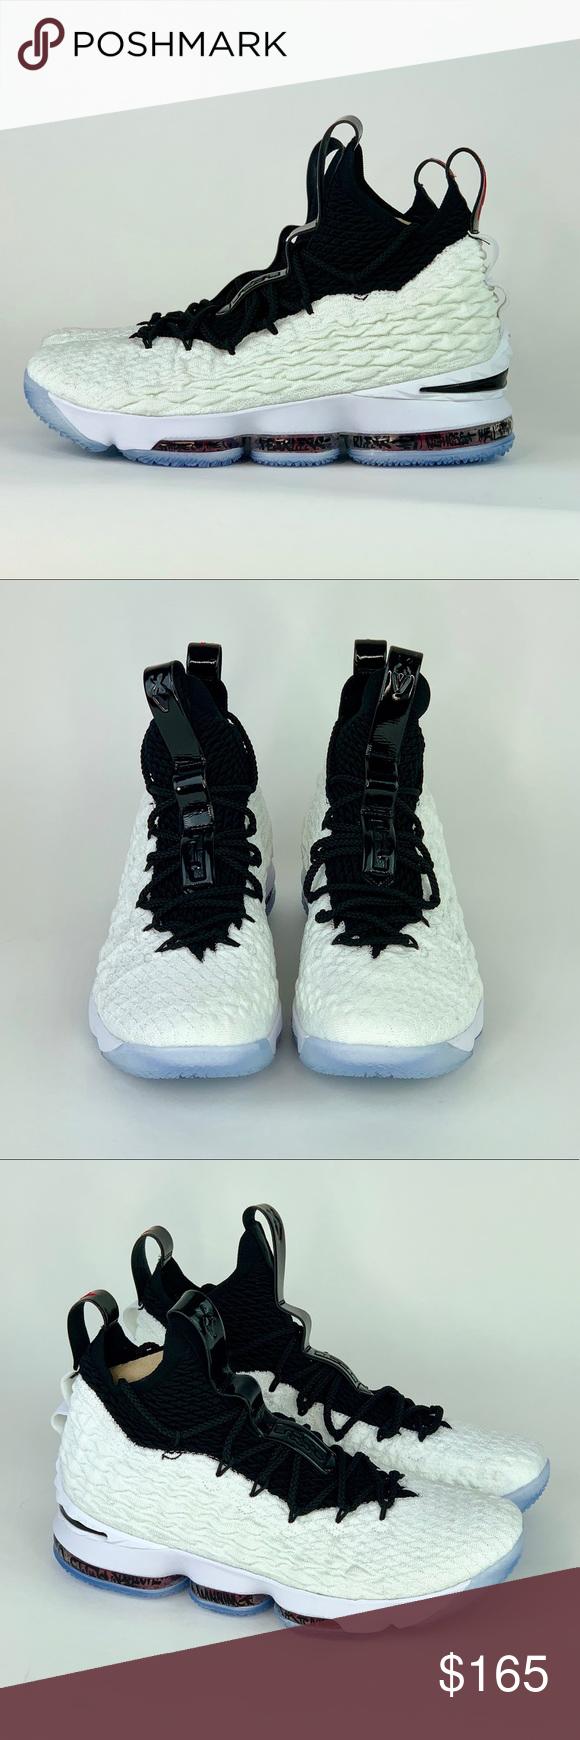 Nike LeBron XV  Graffiti  Basketball Shoe Sz 10 Brand New Nike LeBron XV   5a260ab37